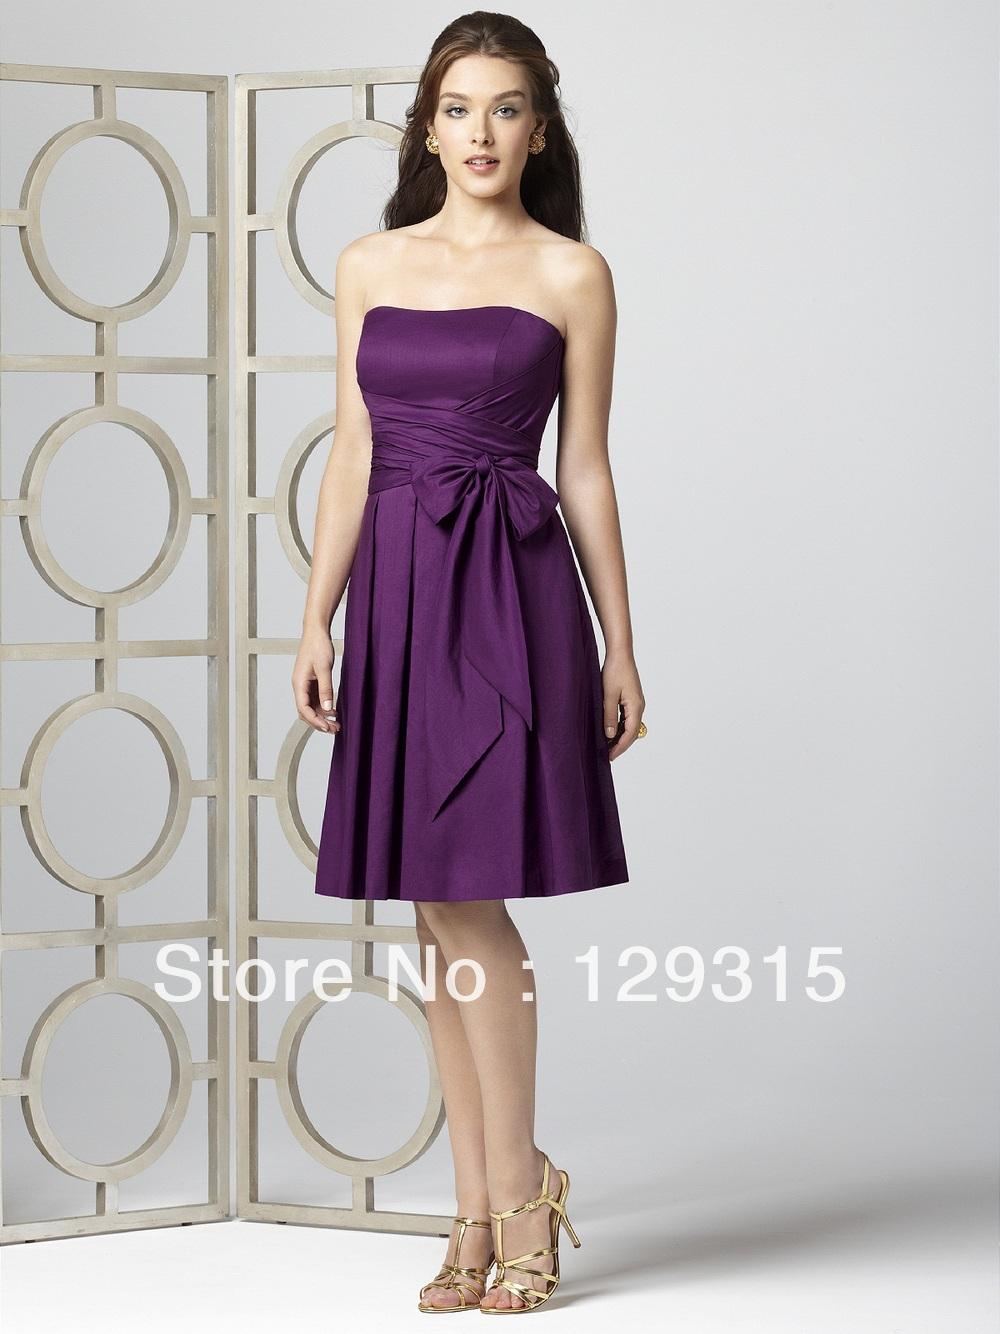 Cheap Prom Dresses 2010